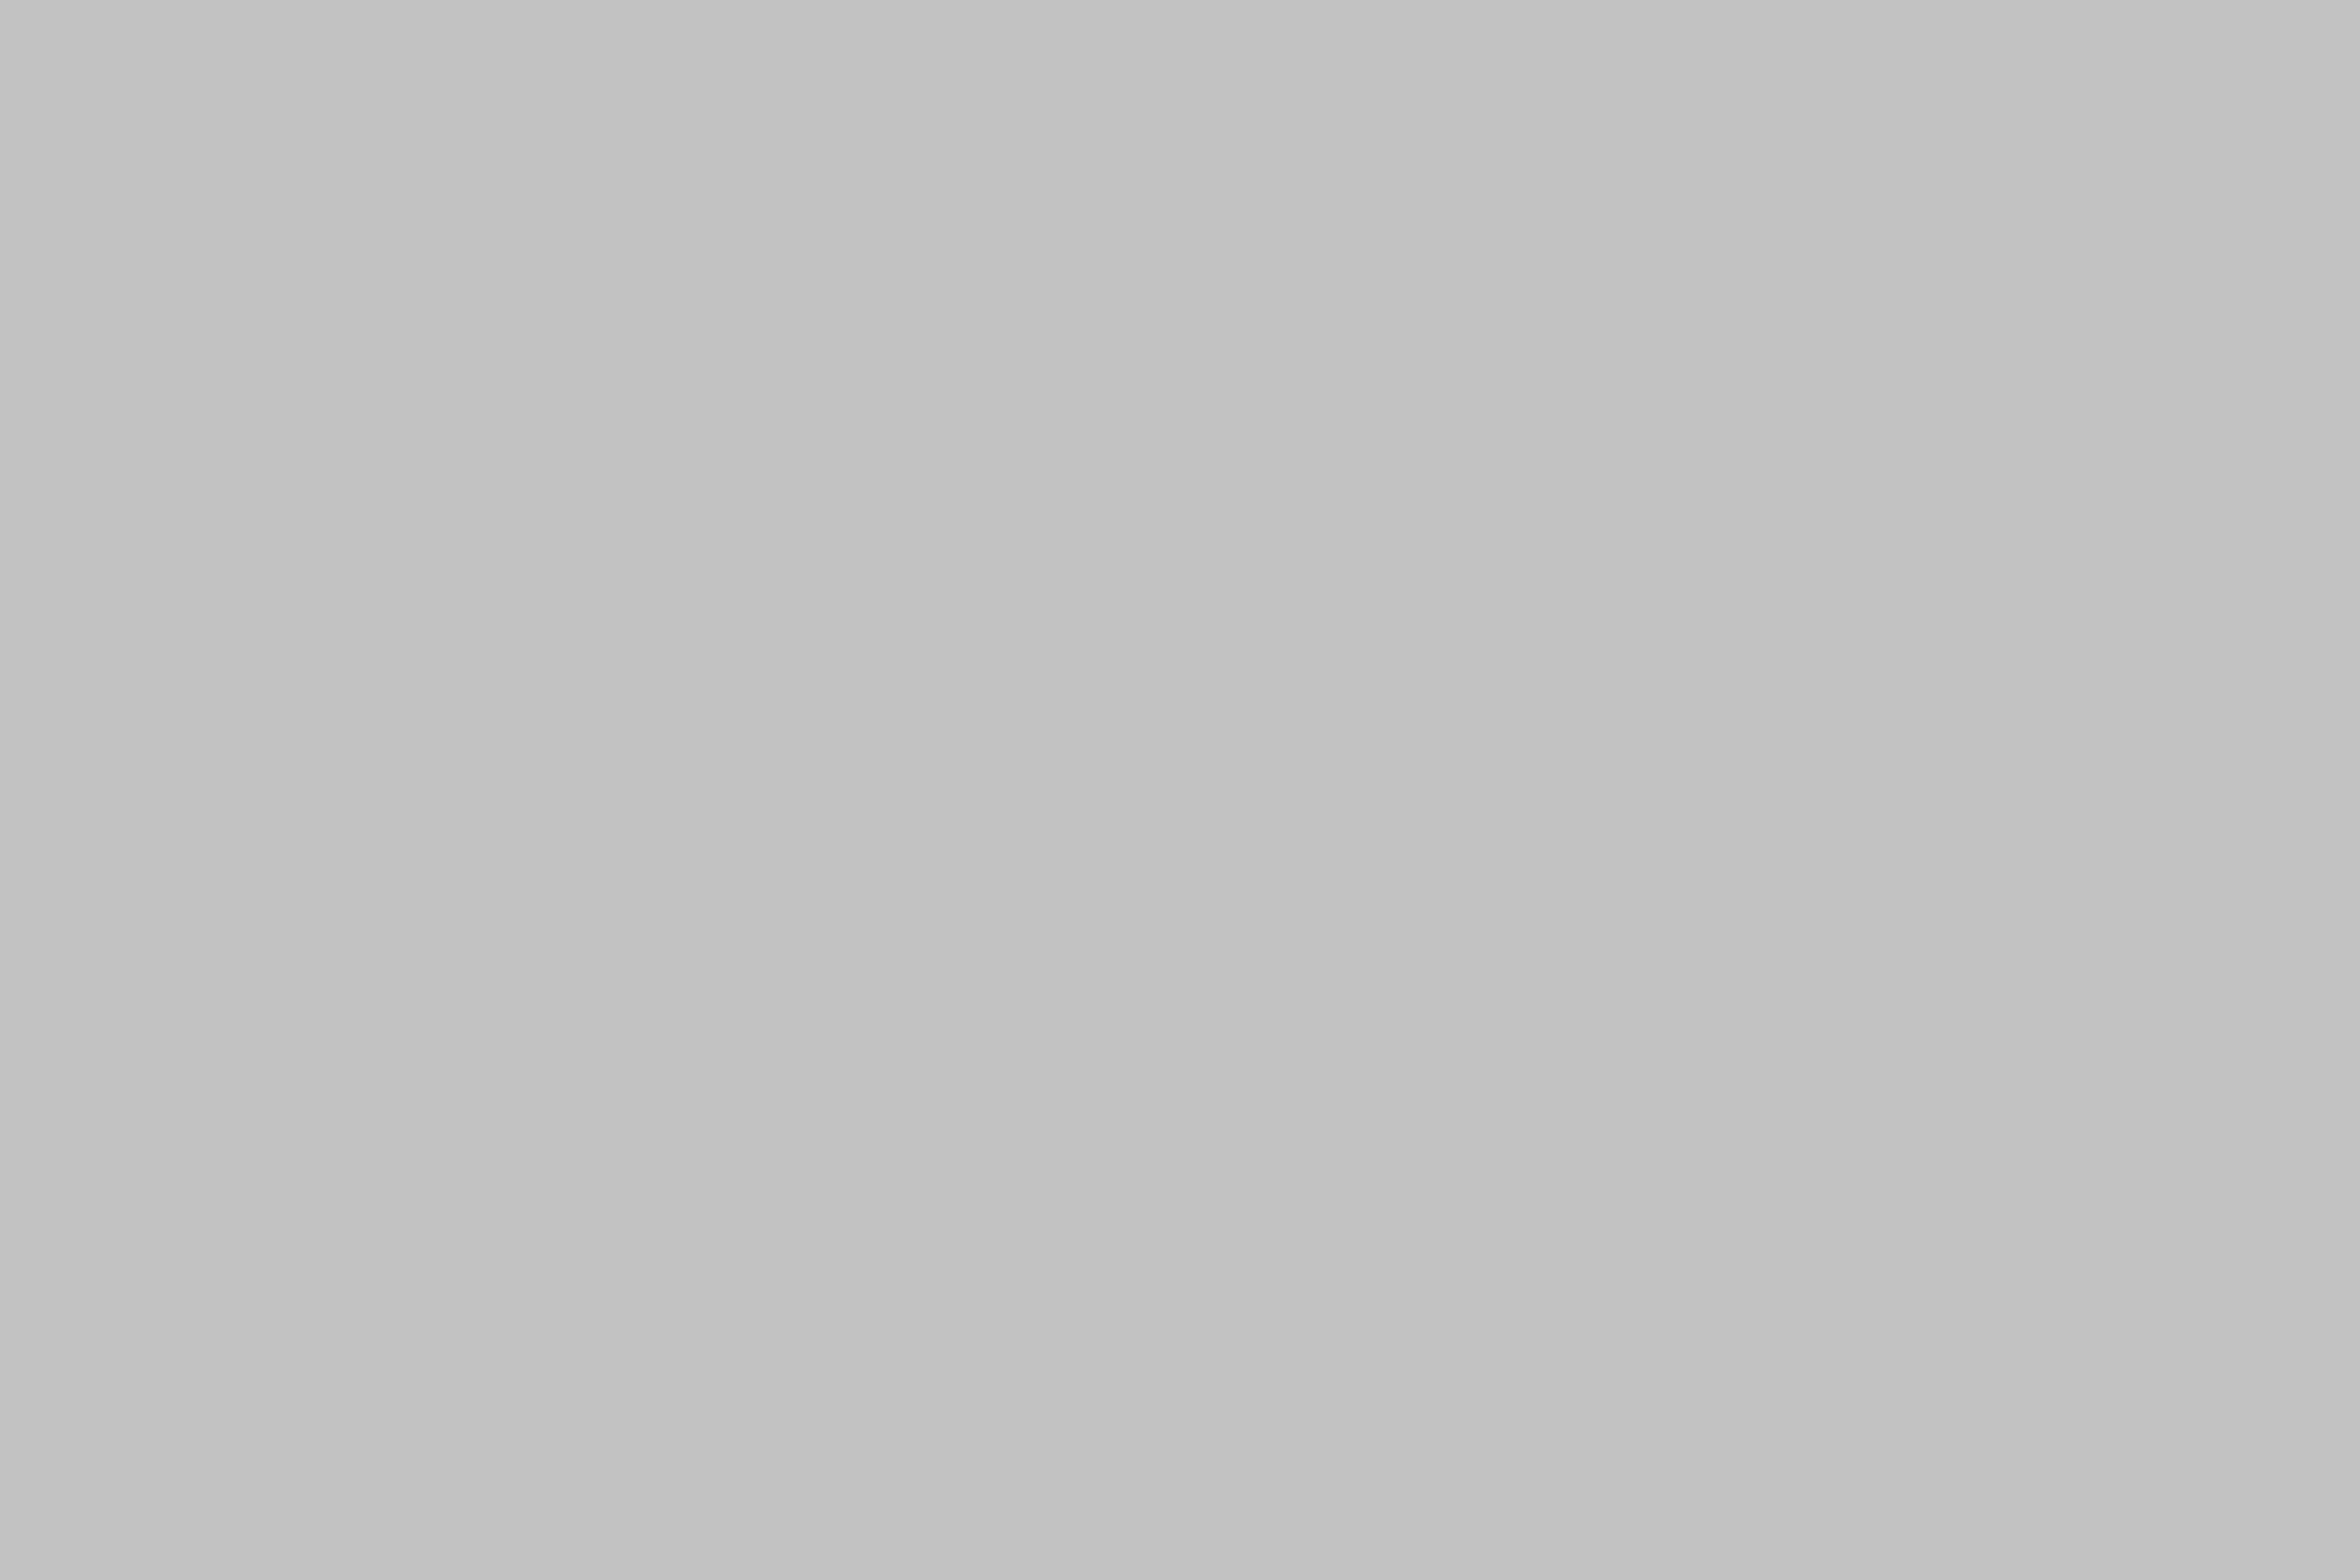 SquareSpace-SermonSeries copy 8.jpg